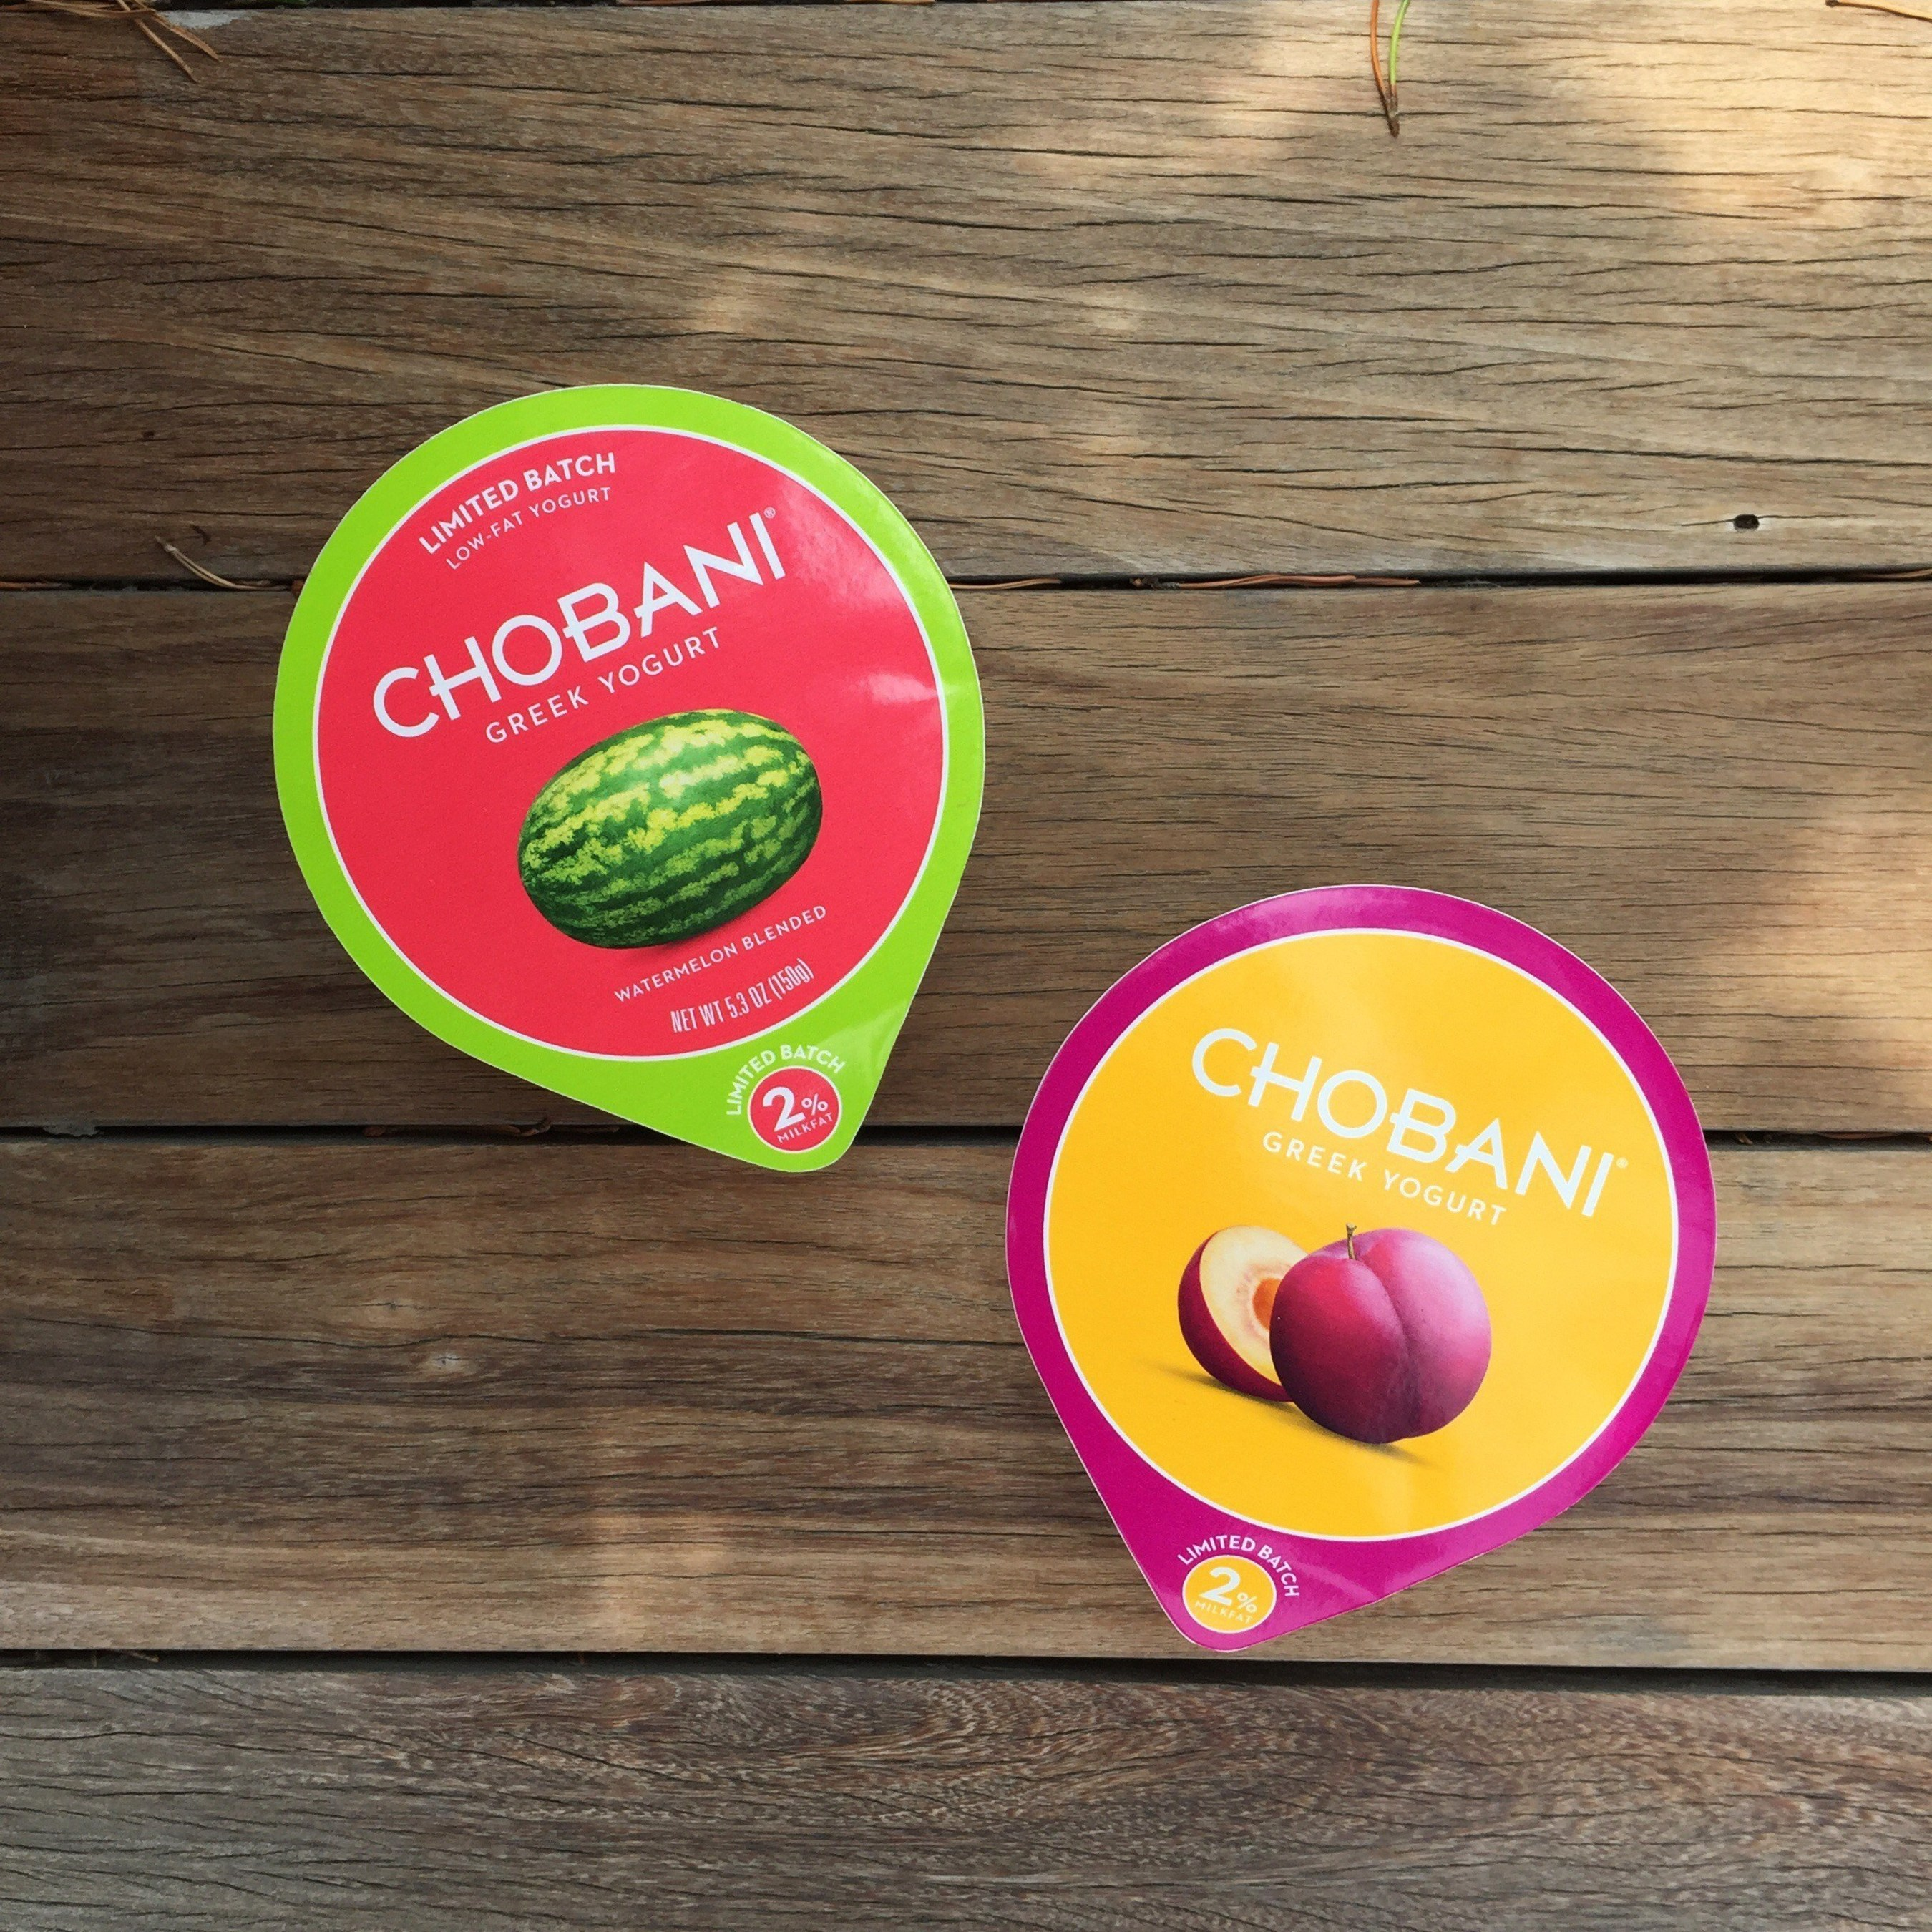 Chobani, America's No. 1-selling Greek Yogurt brand, is launching Limited Batch Plum and bringing back popular Chobani Watermelon, both available through August.